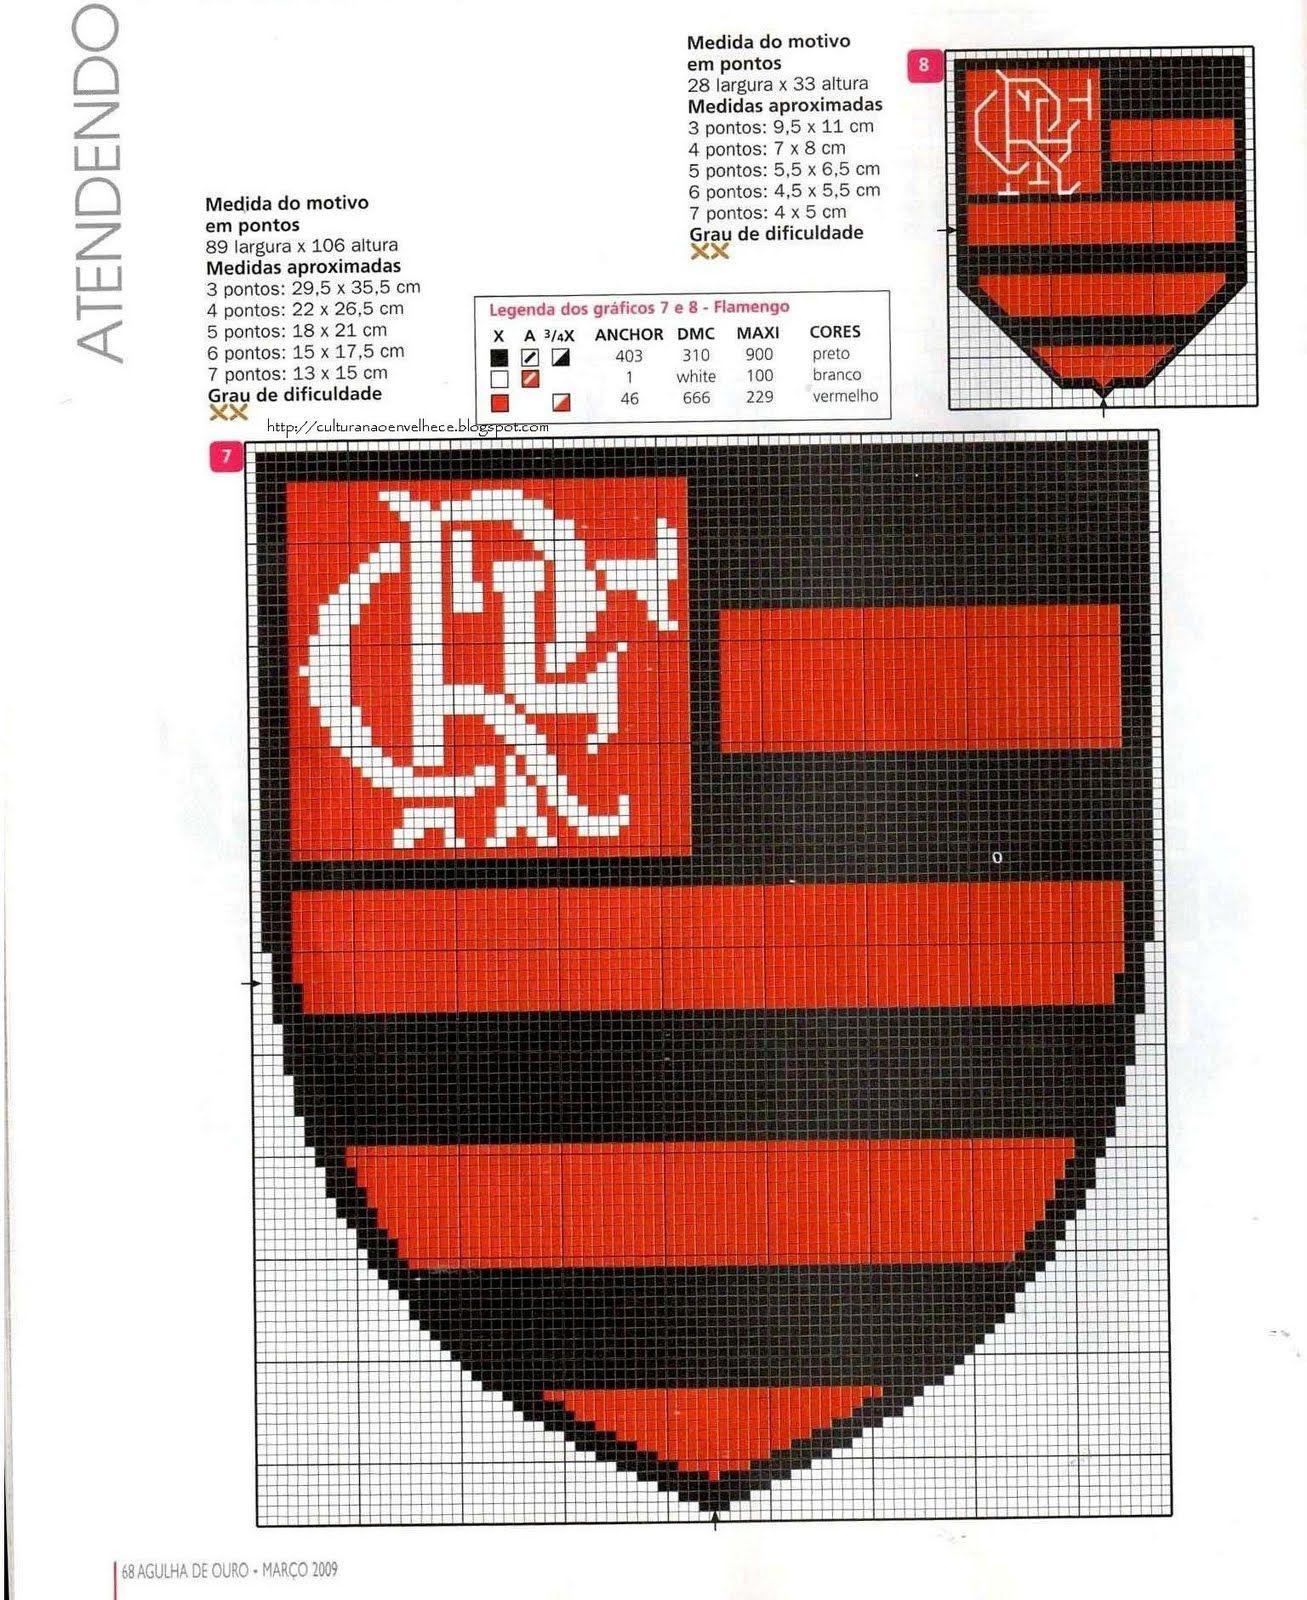 Do Seu Time De Coracao Abaixo O Escudo Do Flamengo